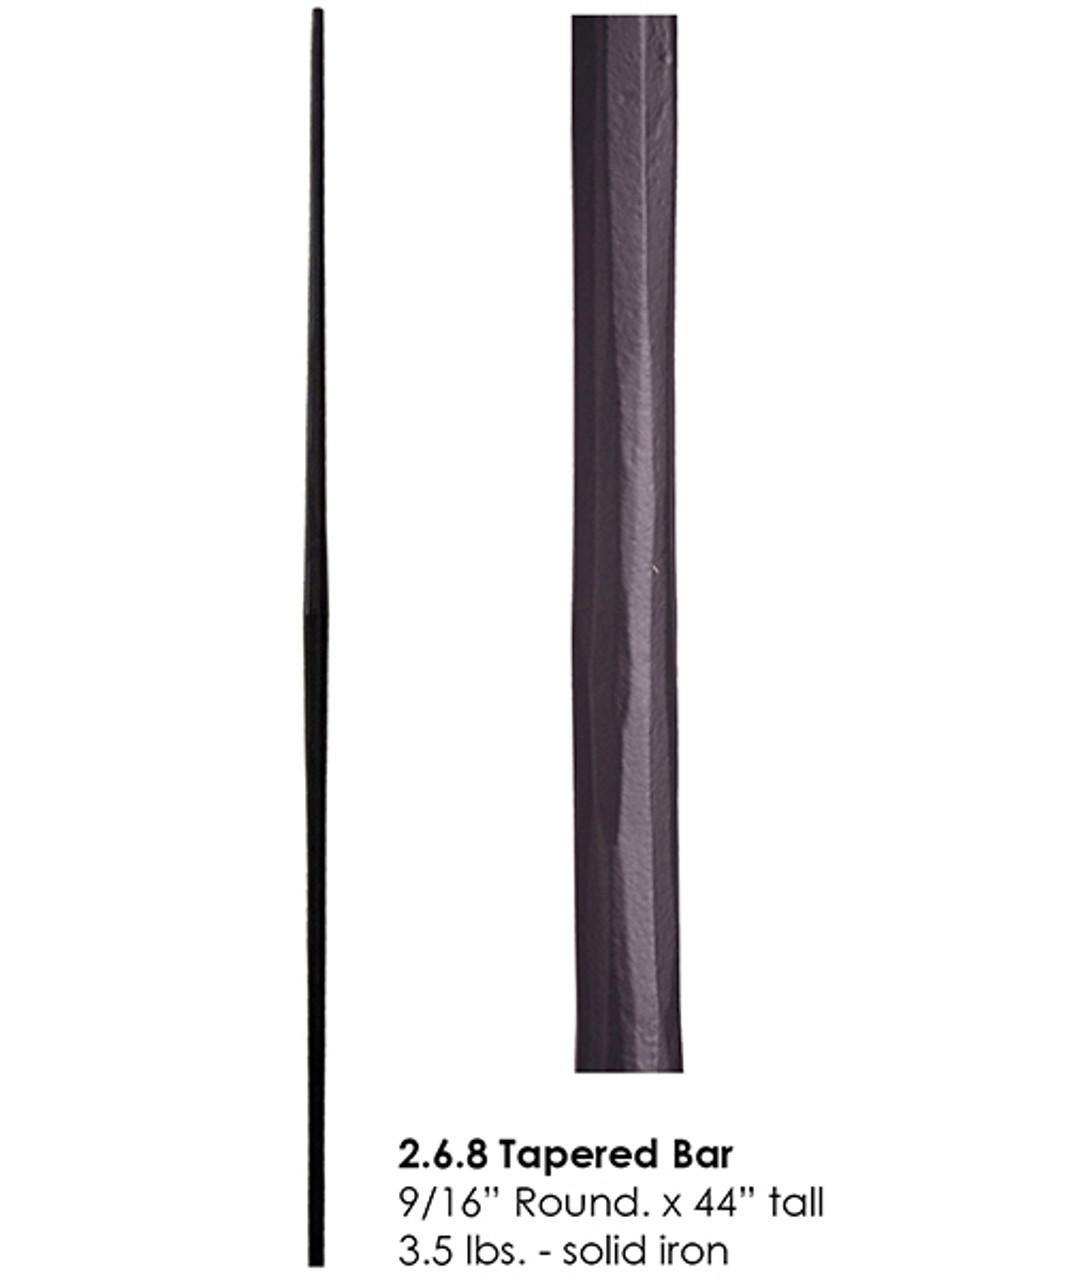 HF2.6.8 Round Tuscan Tapered Bar